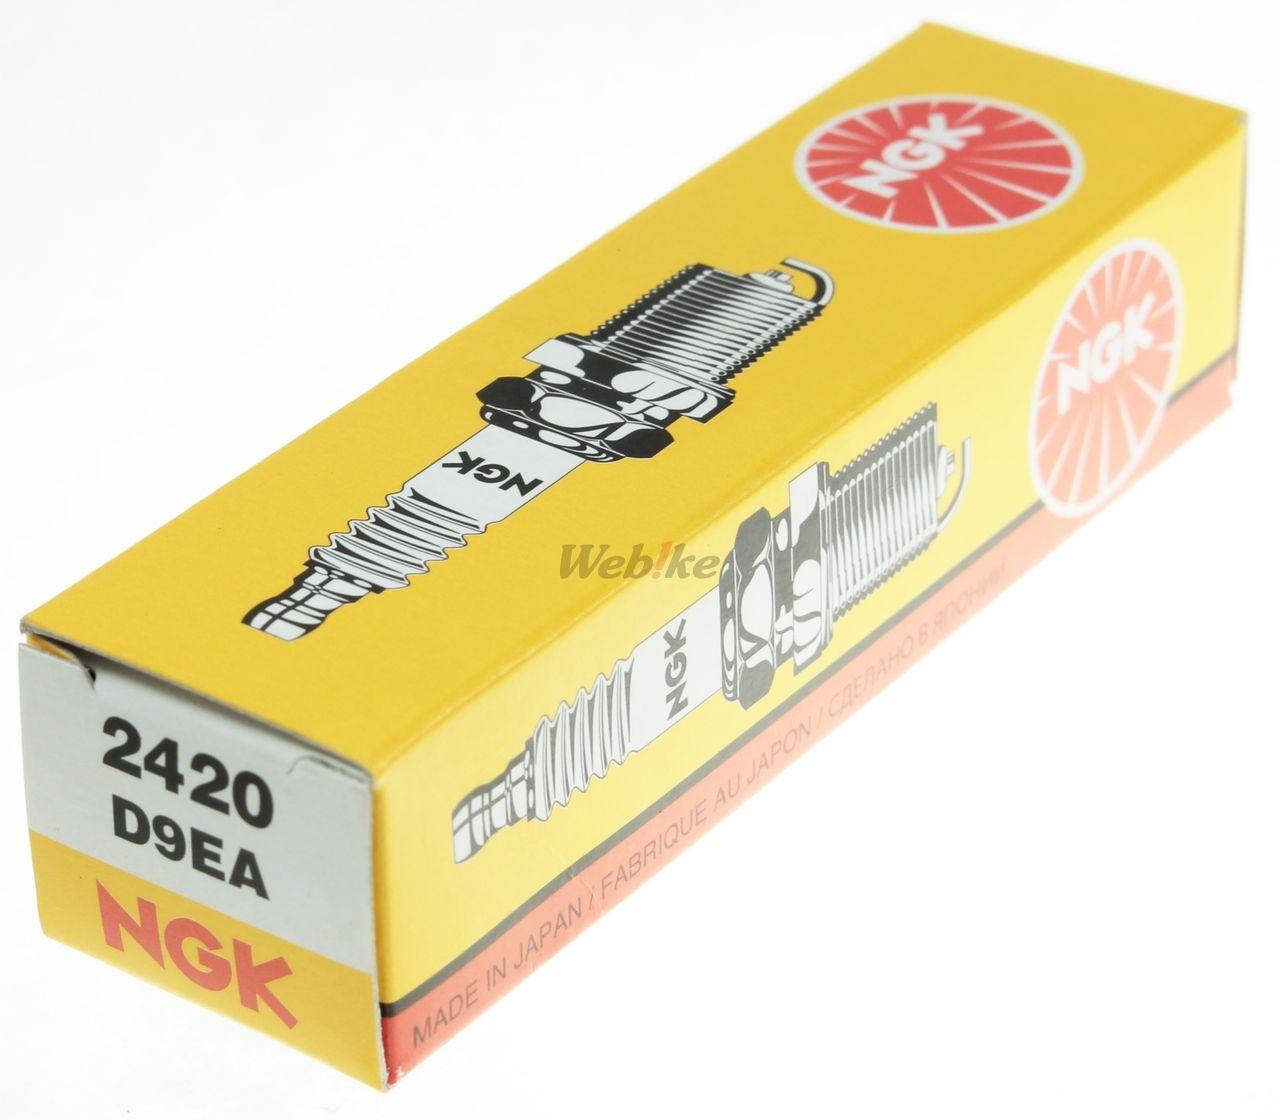 【NGK】標準型 火星塞 D9EA 2420 - 「Webike-摩托百貨」